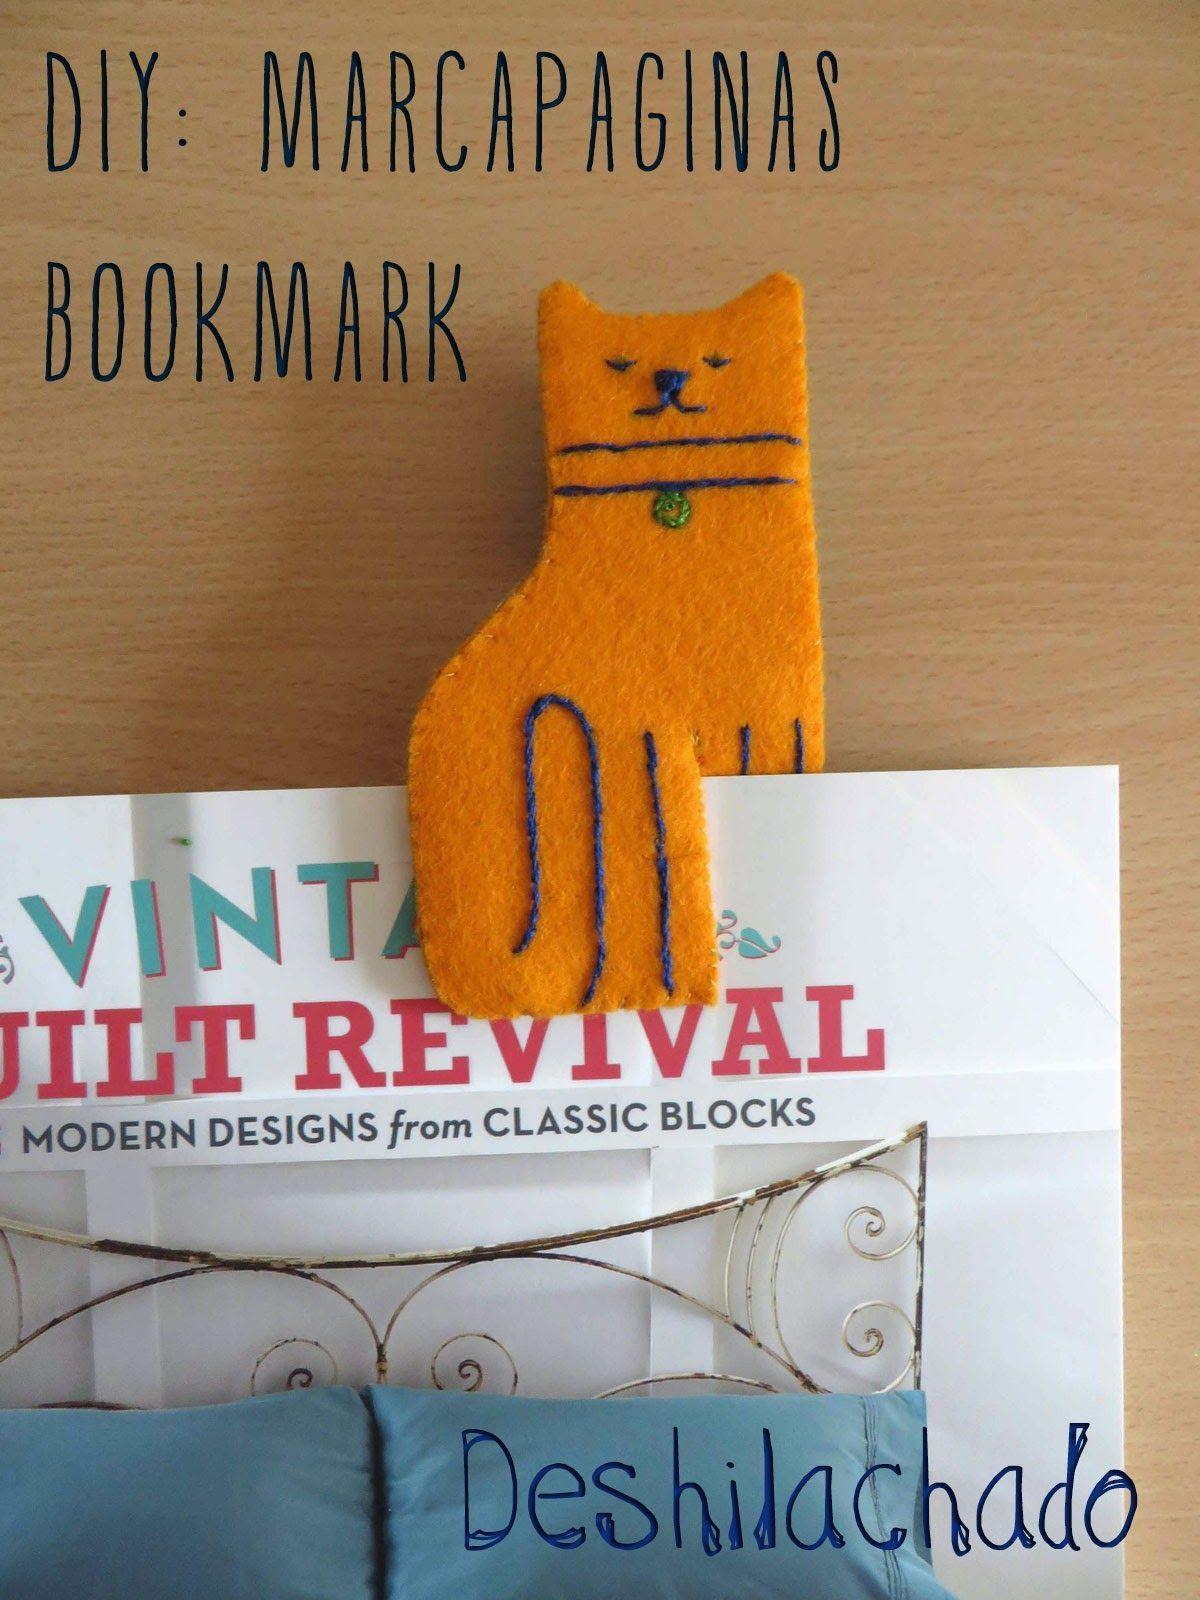 Felt cat bookmark diy bookmark diy ideas diy crafts do it yourself felt cat bookmark diy bookmark diy ideas diy crafts do it yourself diy projects felt cat solutioingenieria Images